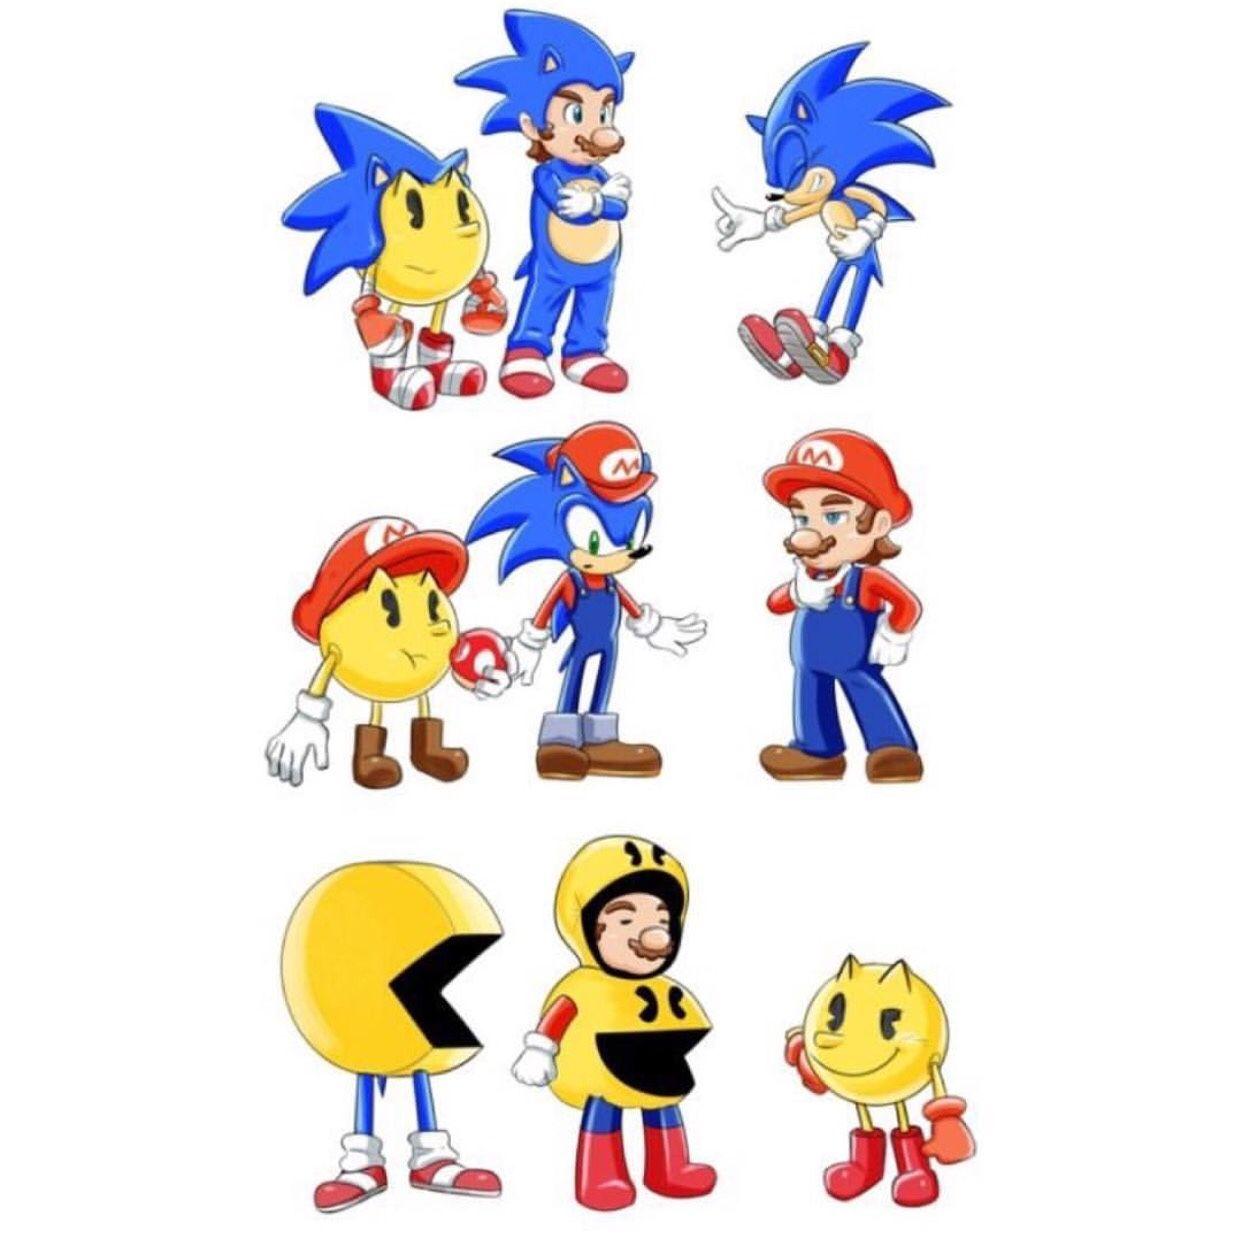 Mario Vs Sonic Vs Megaman Vs Pacman sonic the hedgehog   T...